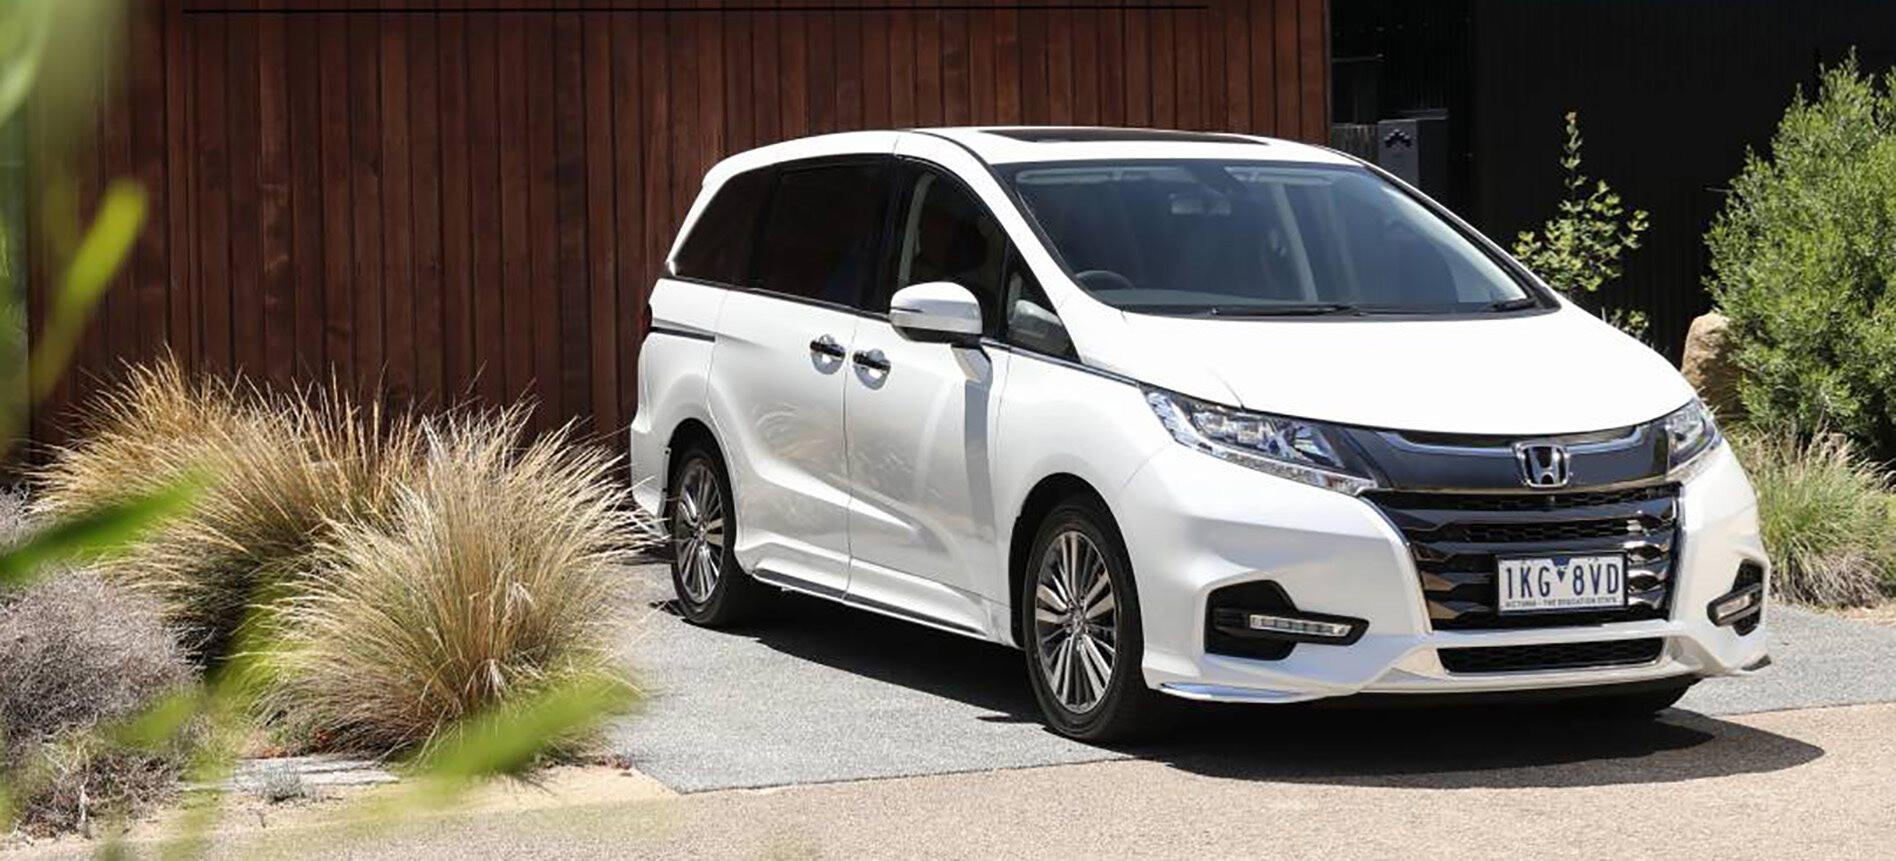 Honda Odyssey VTi-L review